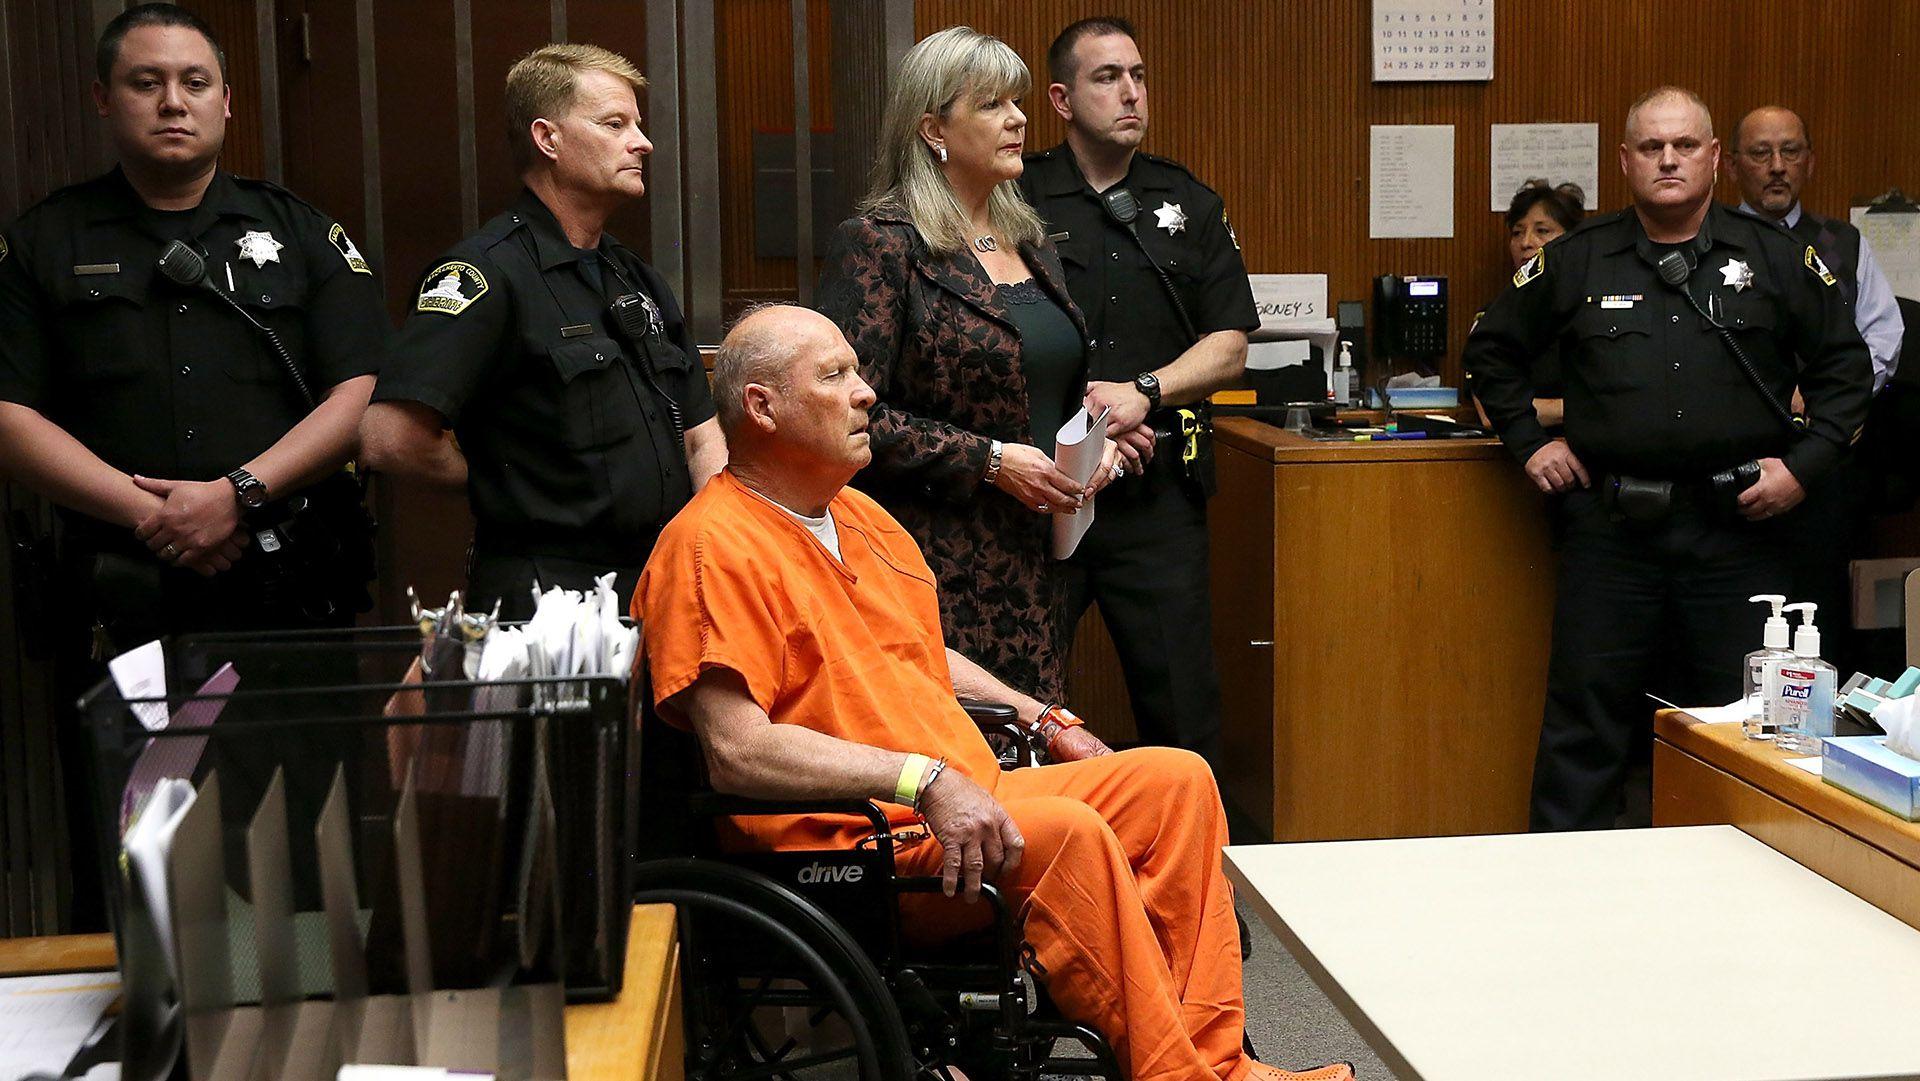 Joseph James DeAngelo es acusado de ser el asesino de Golden State  (Photo by Justin Sullivan/Getty Images)